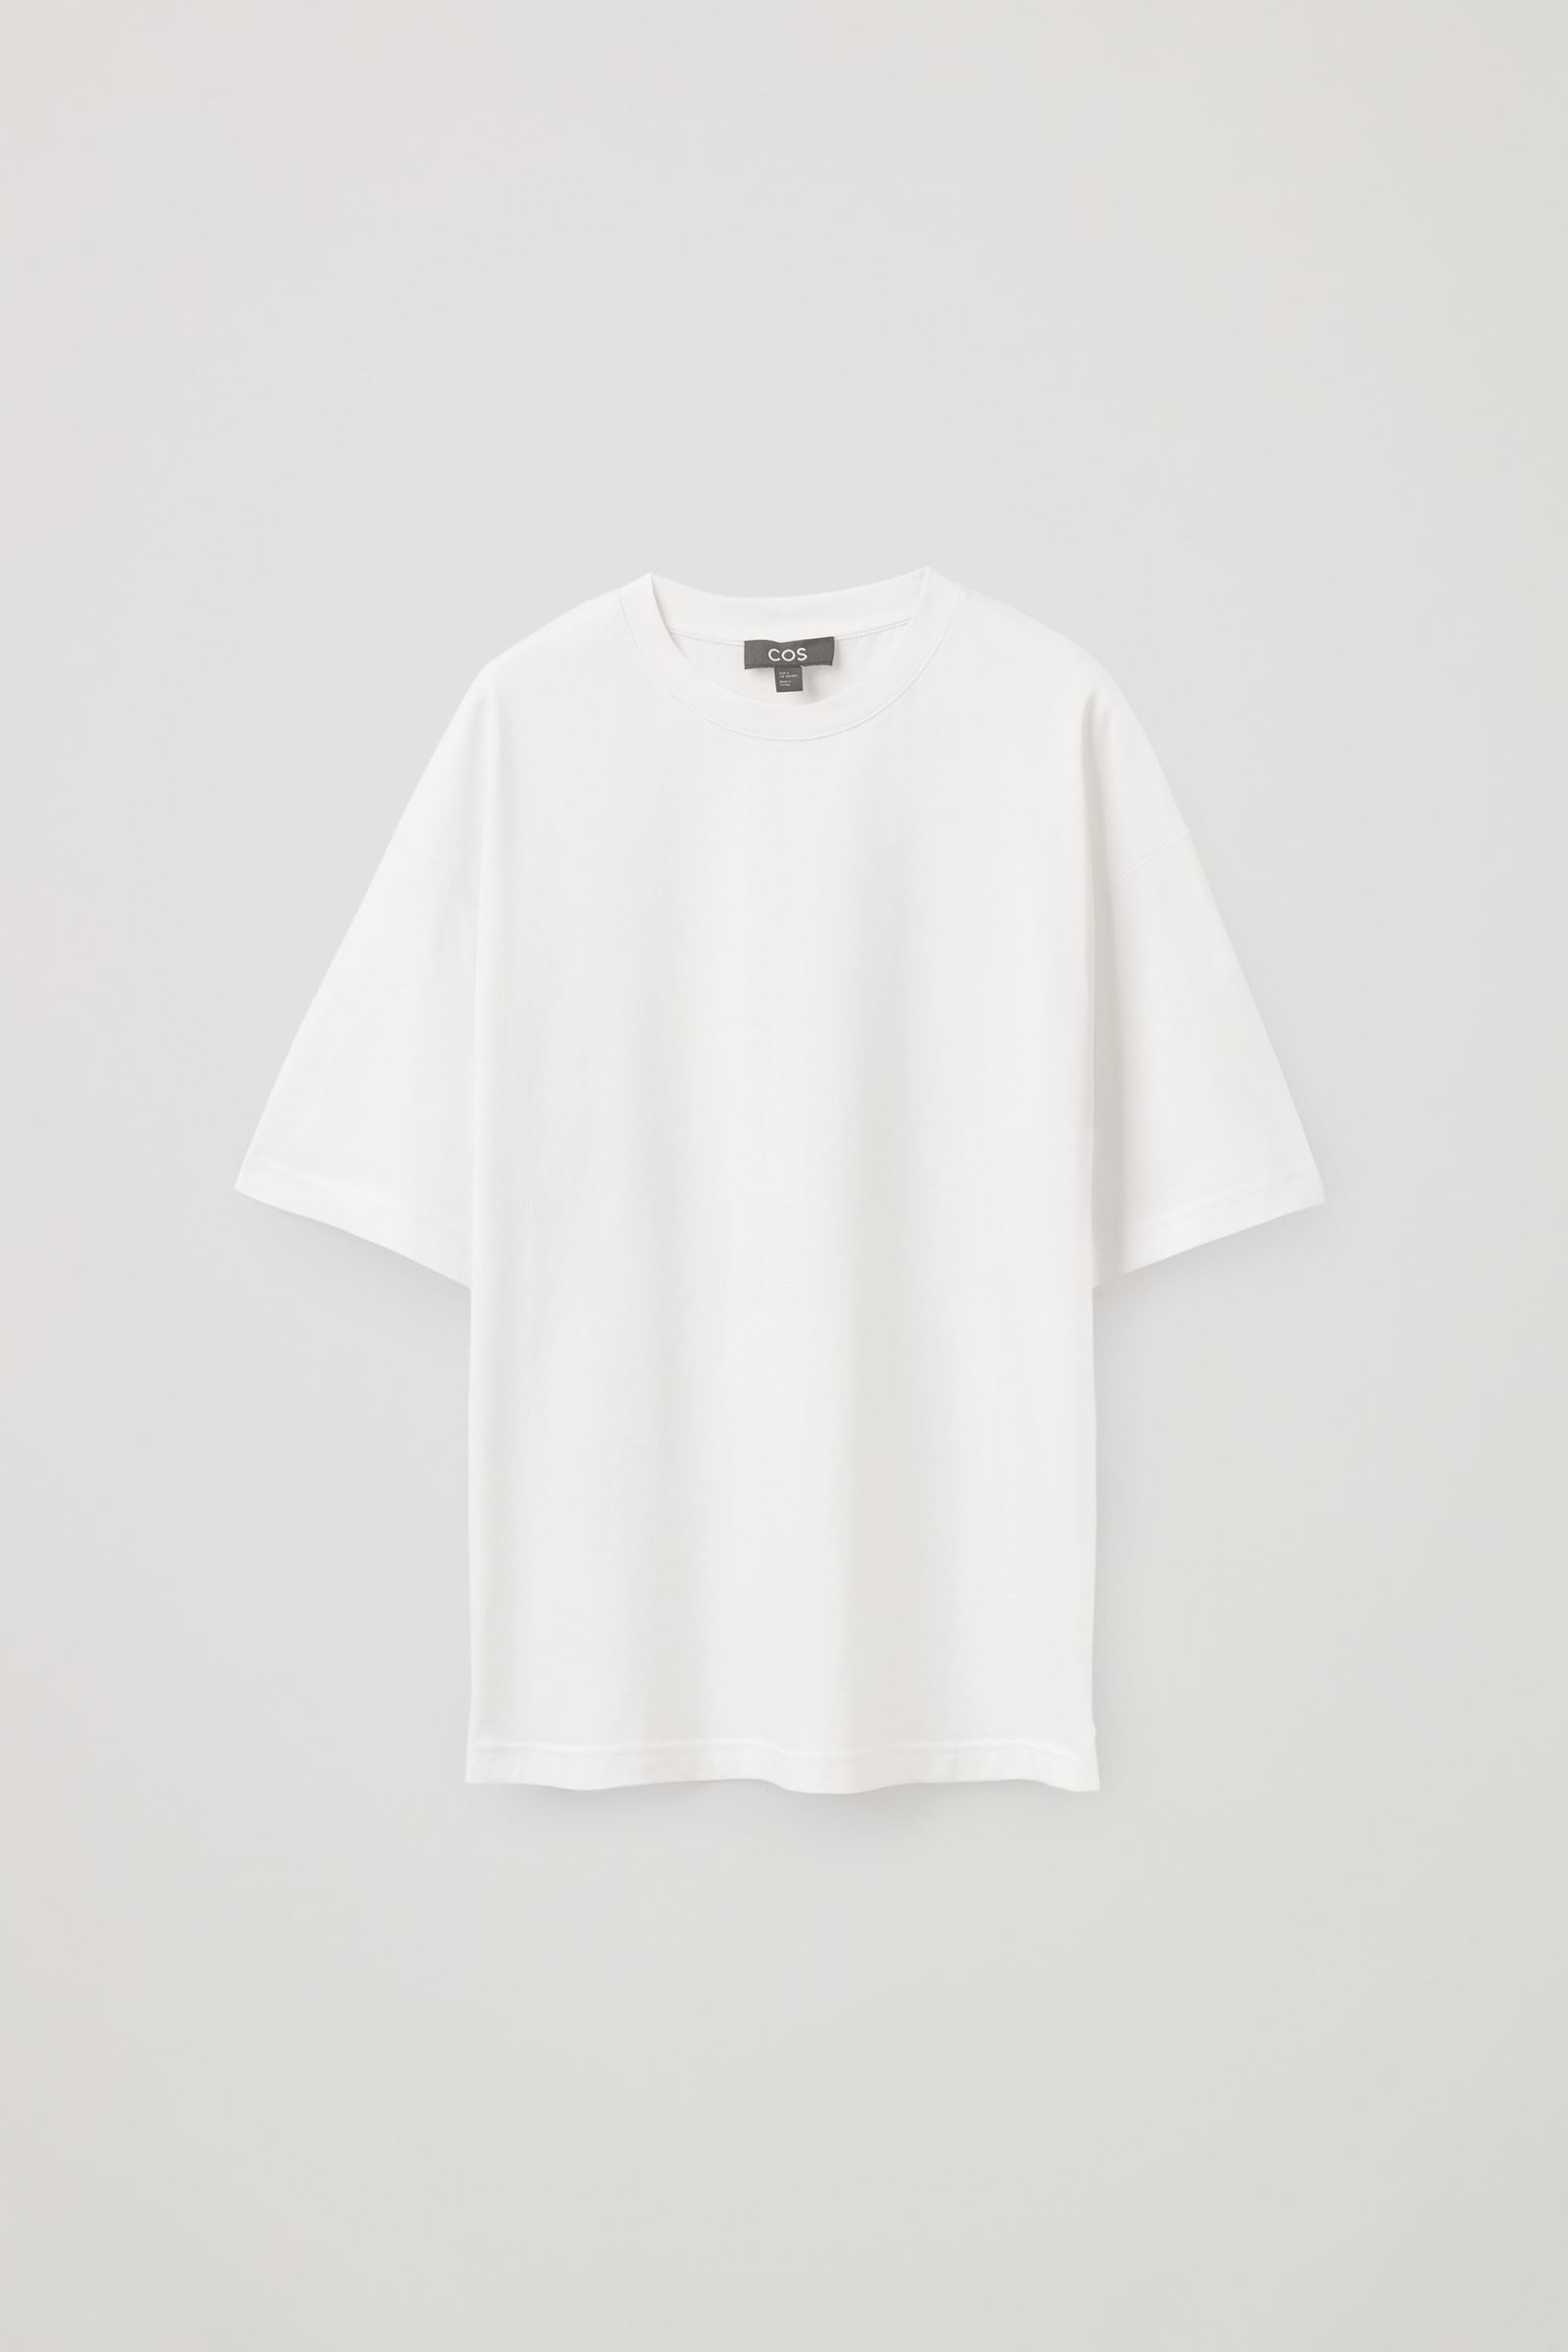 COS 오버사이즈 핏 티셔츠의 화이트컬러 Product입니다.